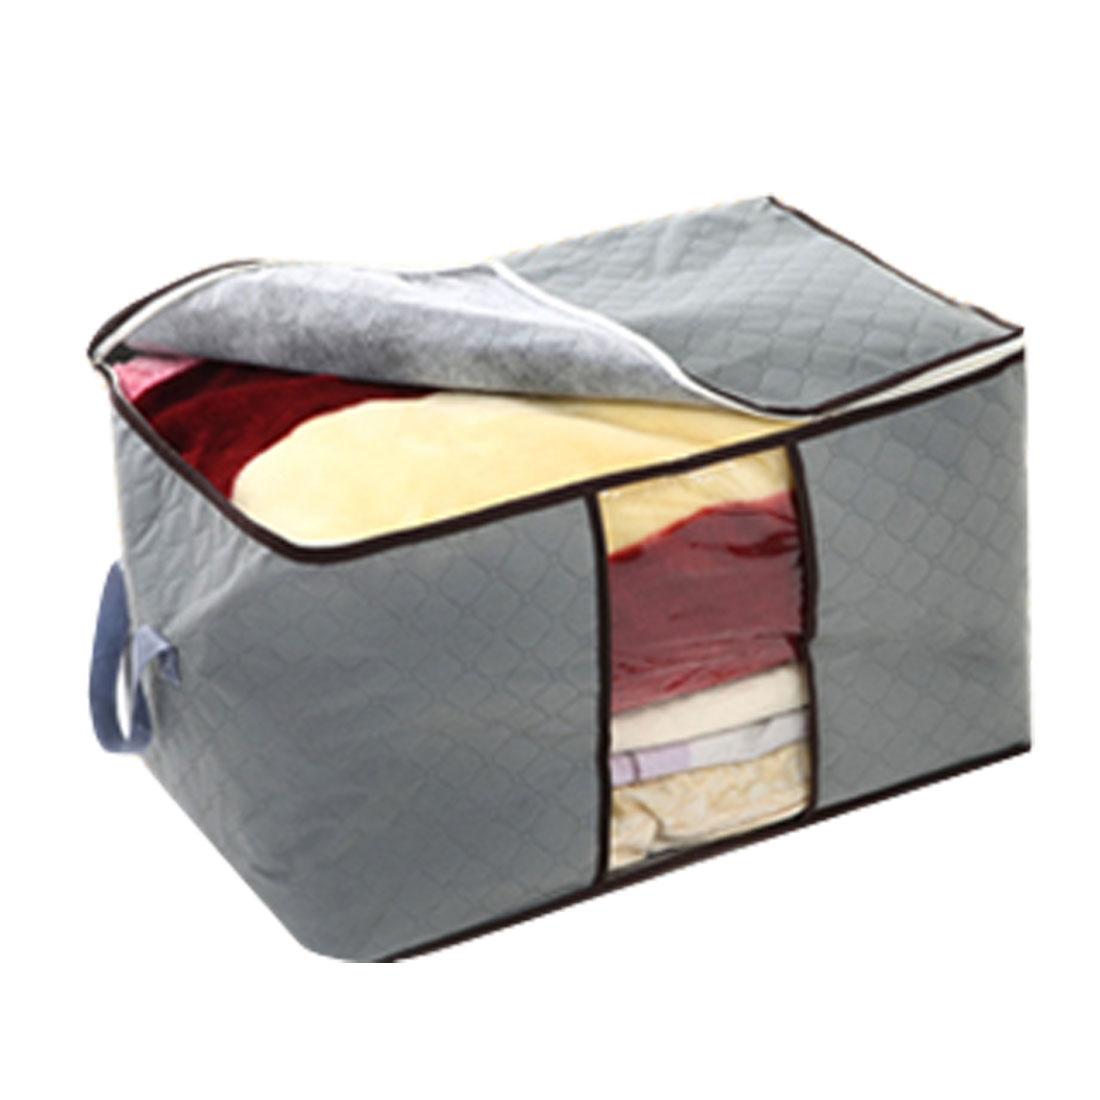 Gray Non-waven Checkered Pattern Quilt Clothes Storage Bag Case Holder